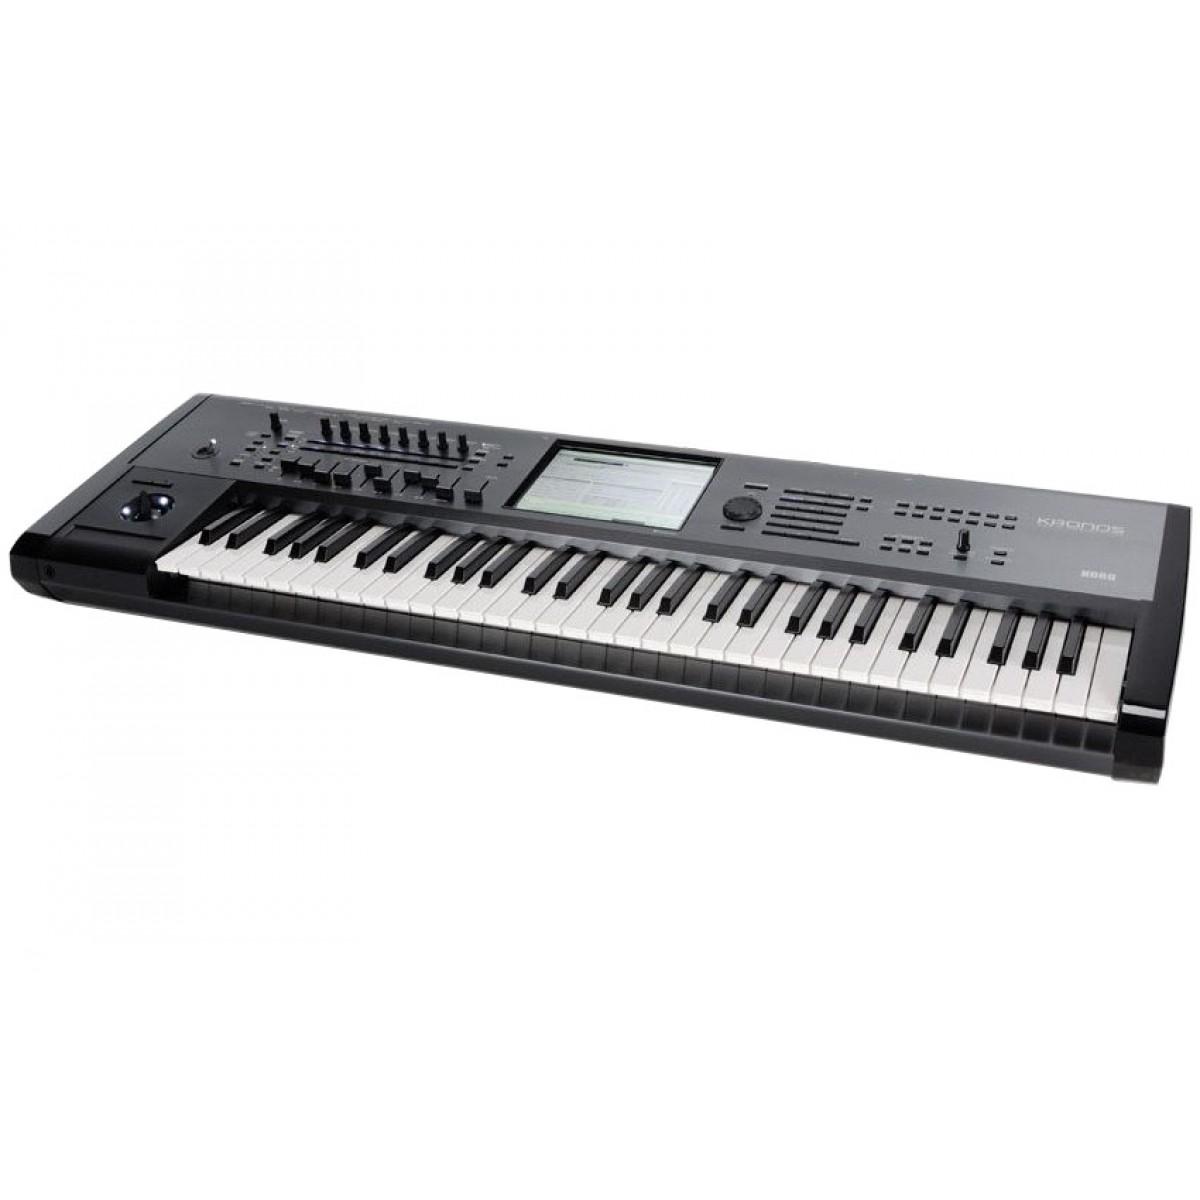 Korg Kronos 88 | Buy Music Workstation | Best Price